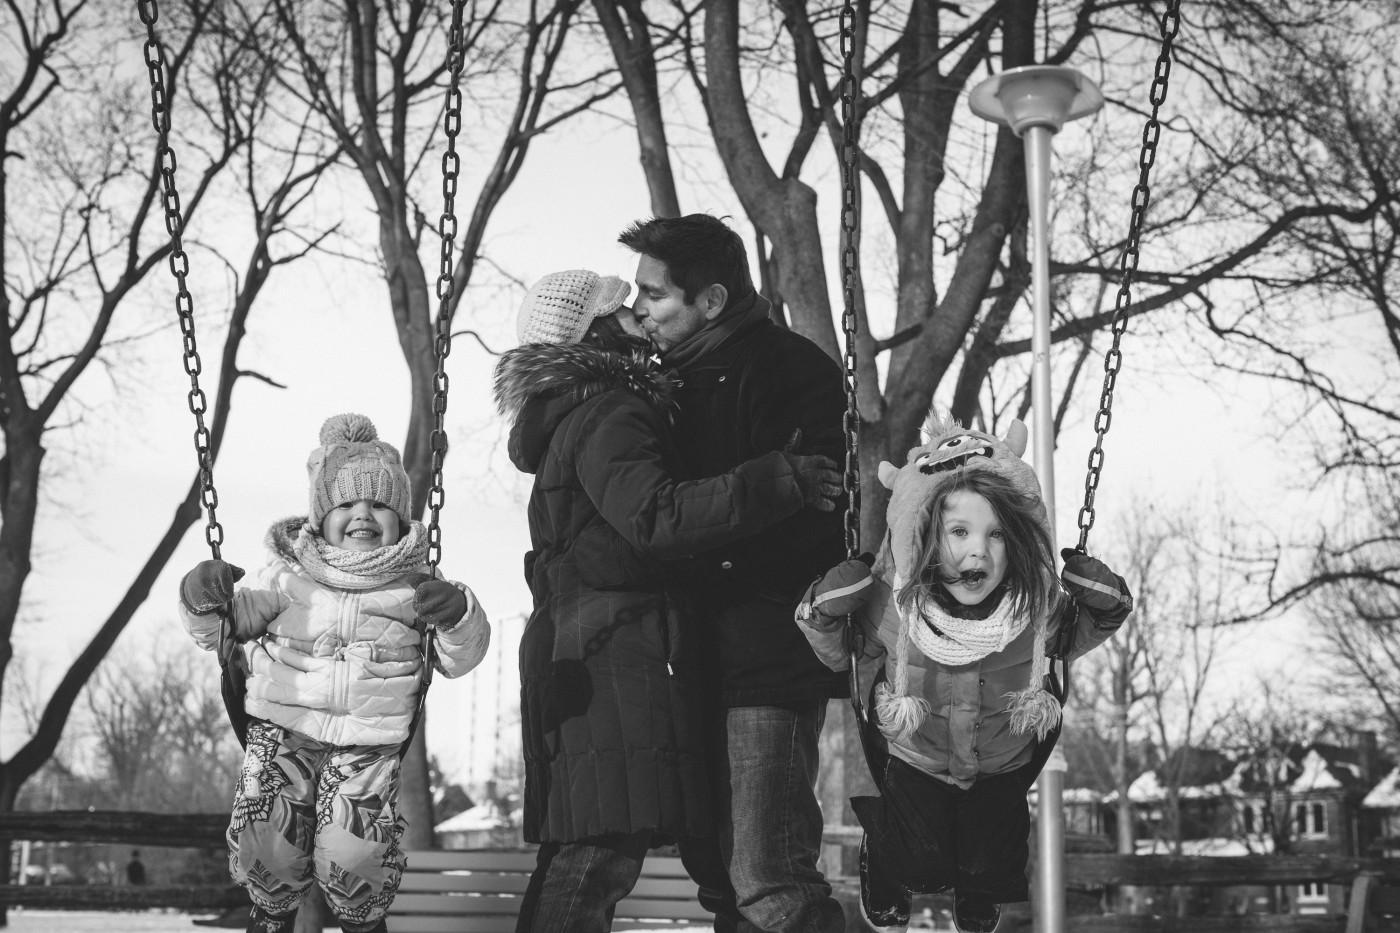 Colin Boyd Shafer, </span><span><em>Jessica and Mark Embracing in Toronto's Dufferin Grove Park</em>, </span><span>2015